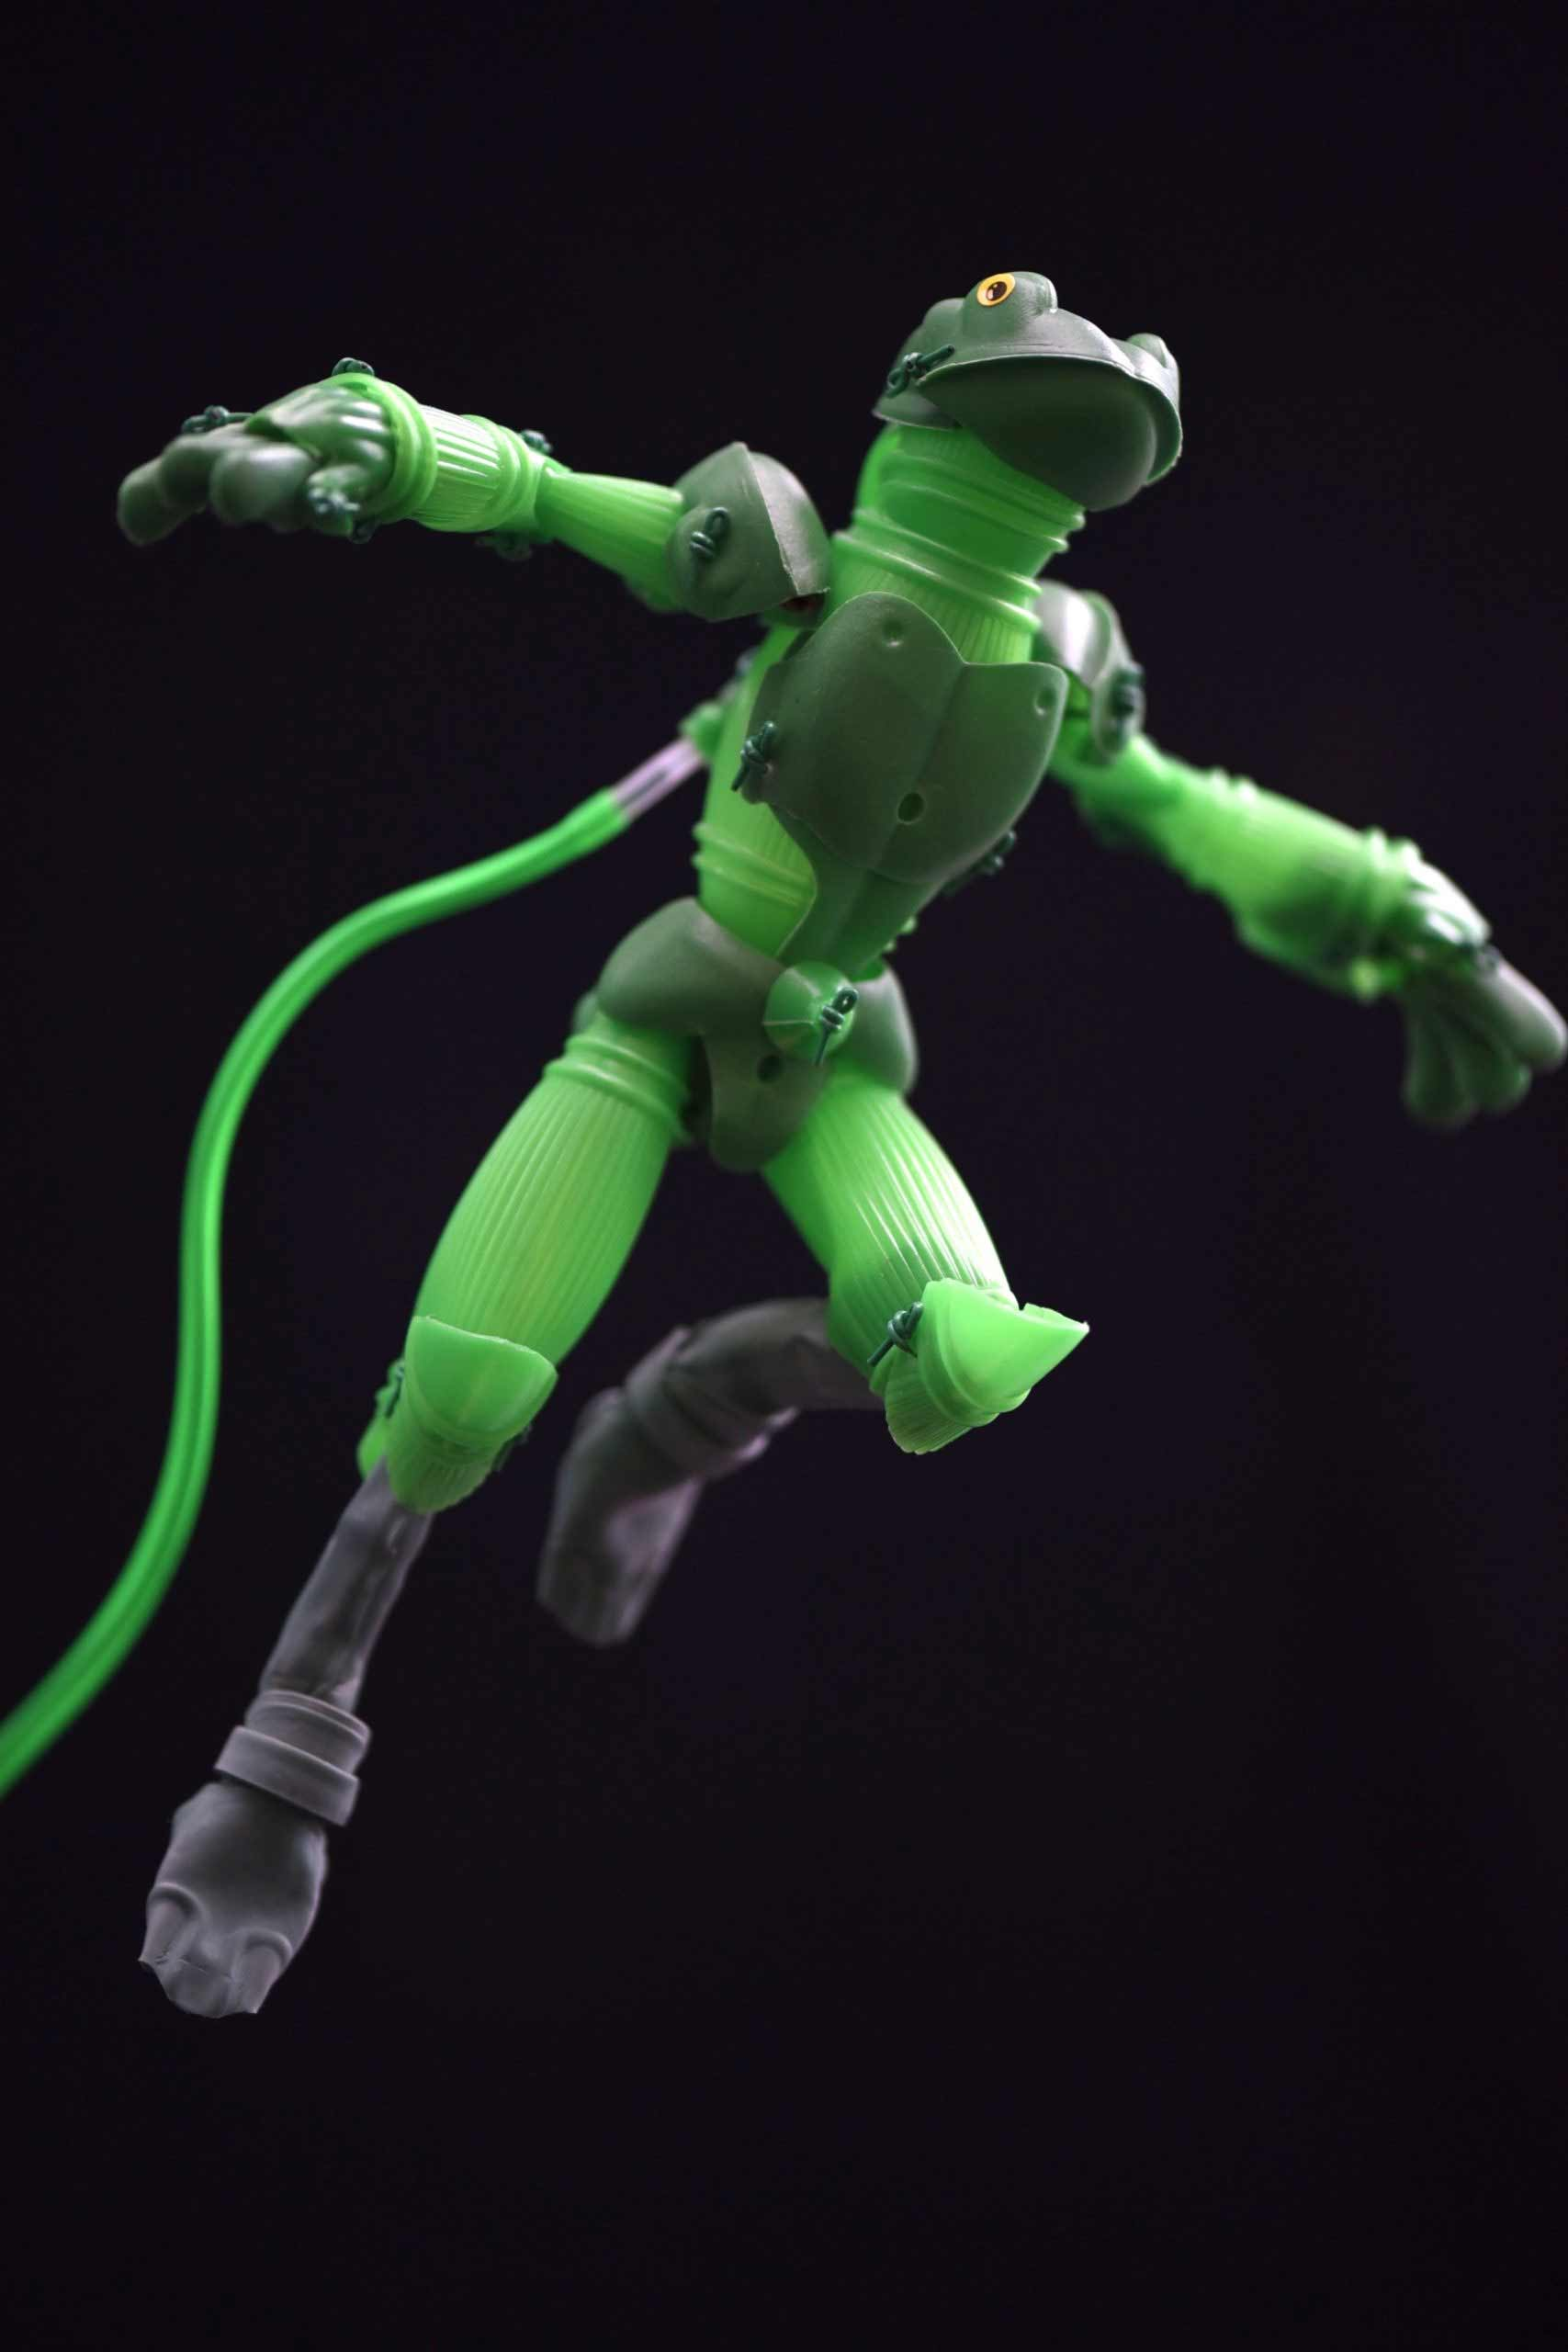 Quietscheentchen-Actionfigur quietscheentchen-actionfiguren-Tomohiro-Yasui_06